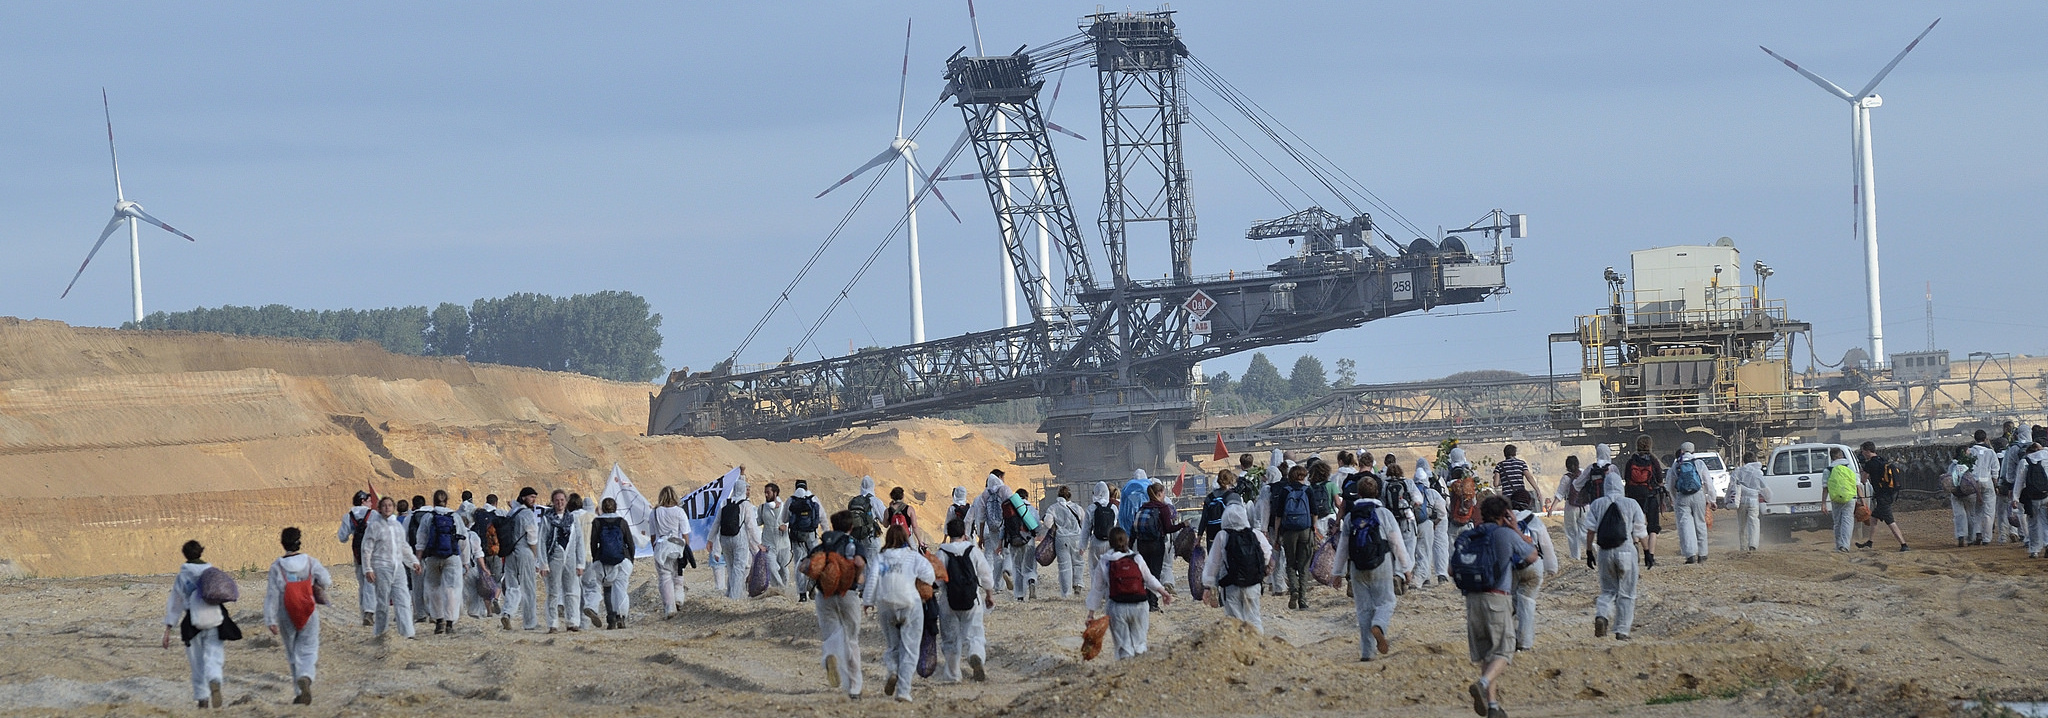 Largest Coal Mine